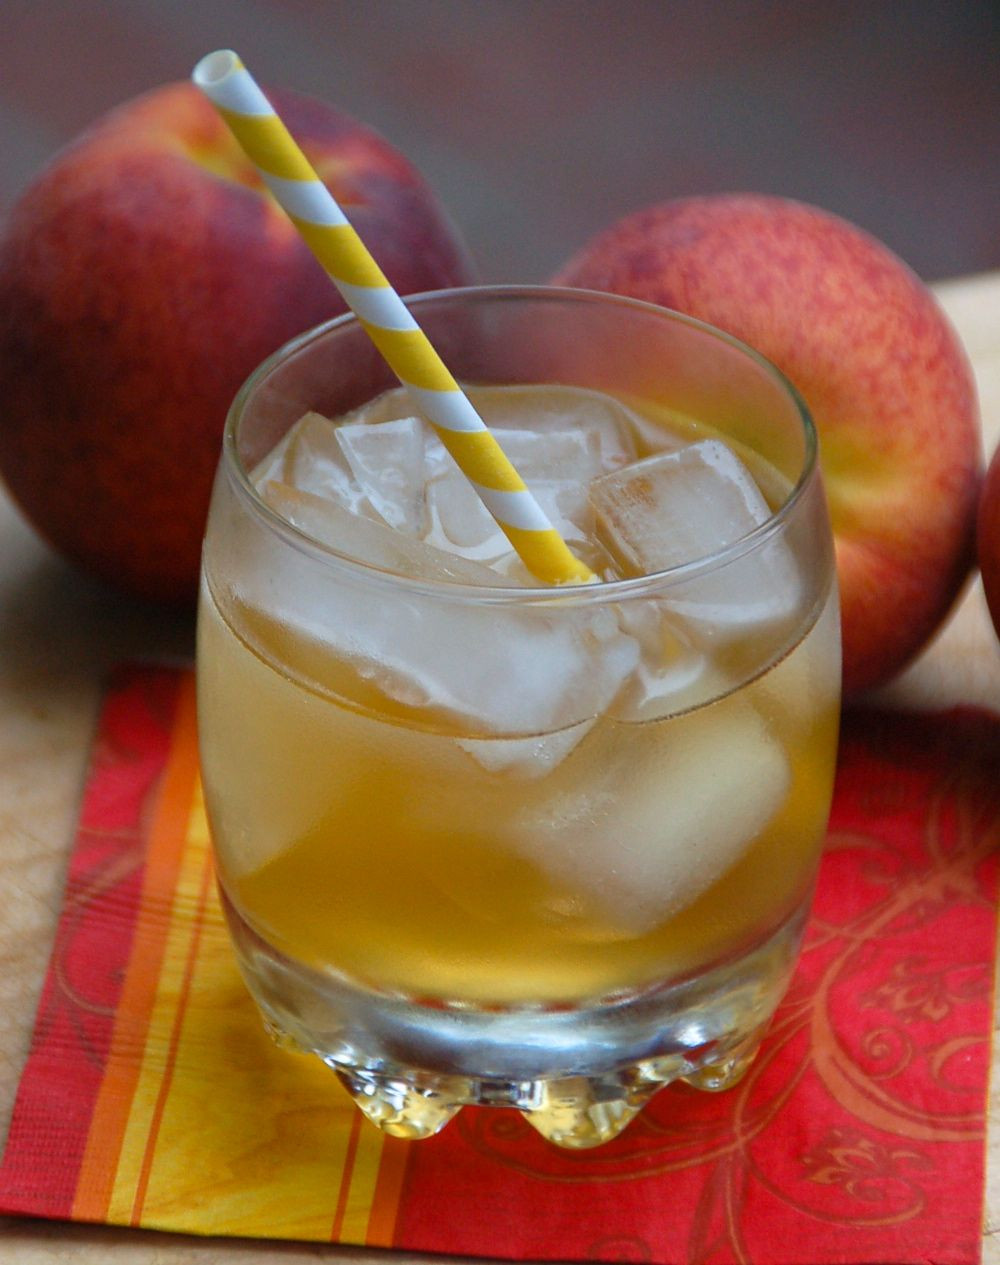 Peach Whiskey Drinks  Fuzzy Fire 1 ounce Fireball Whisky ½ peach schnapps 3